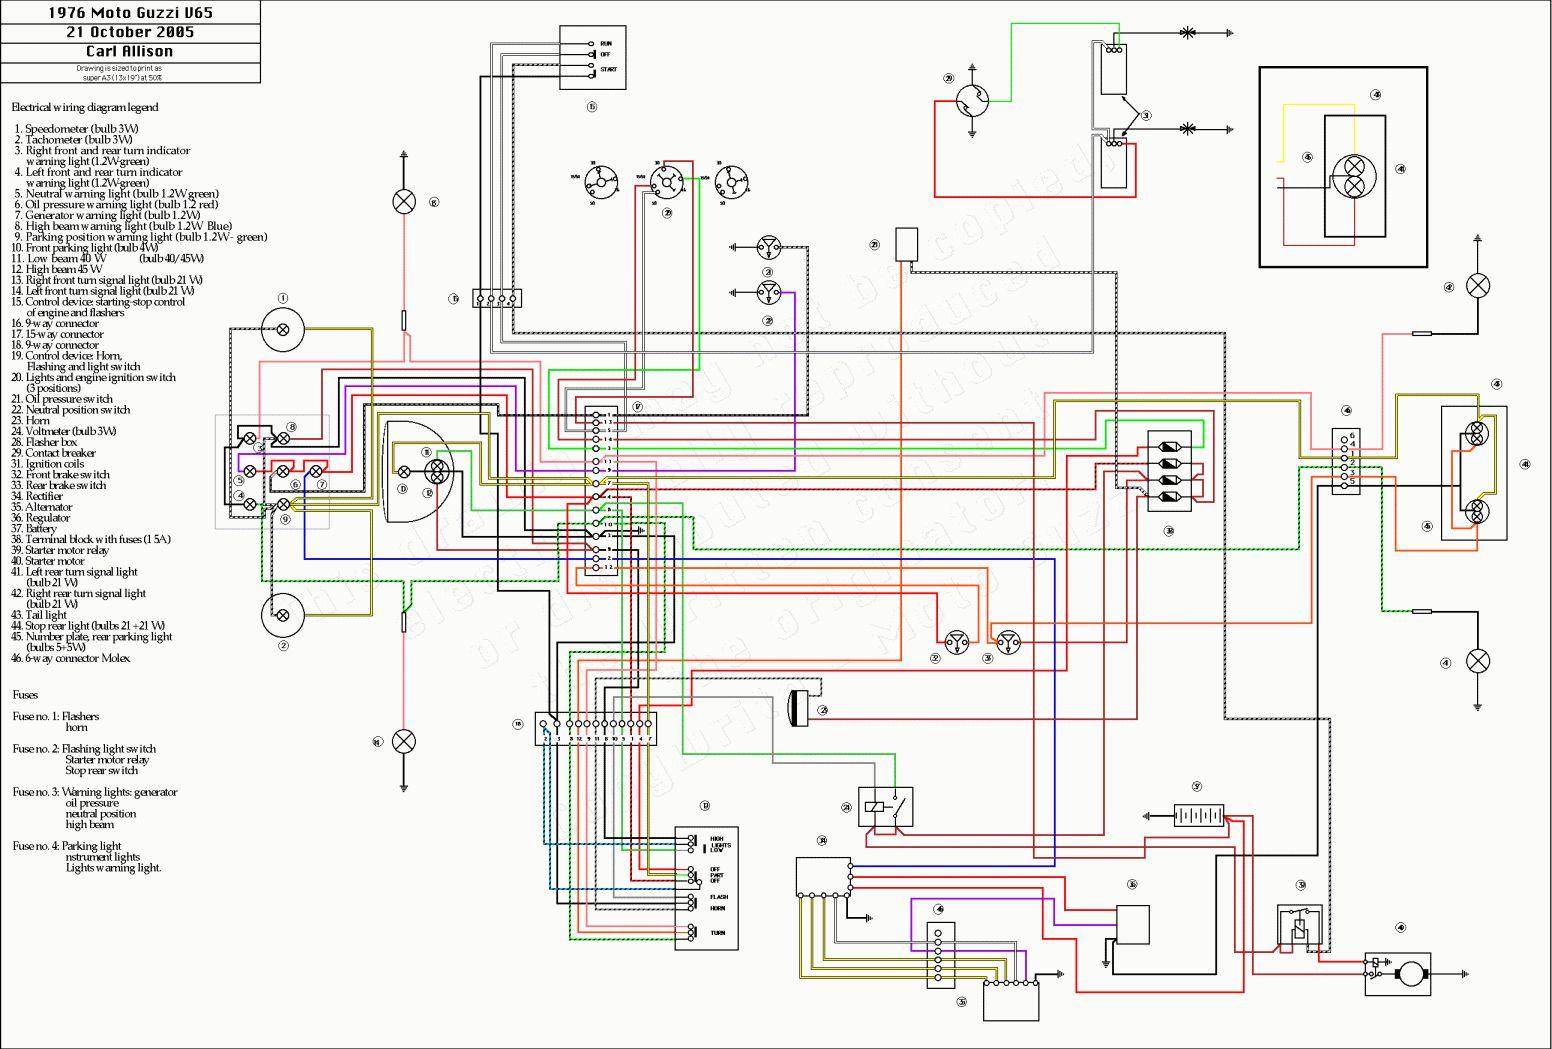 Yamaha V50 Motorcycle Wiring Diagram and Sportissimo.html